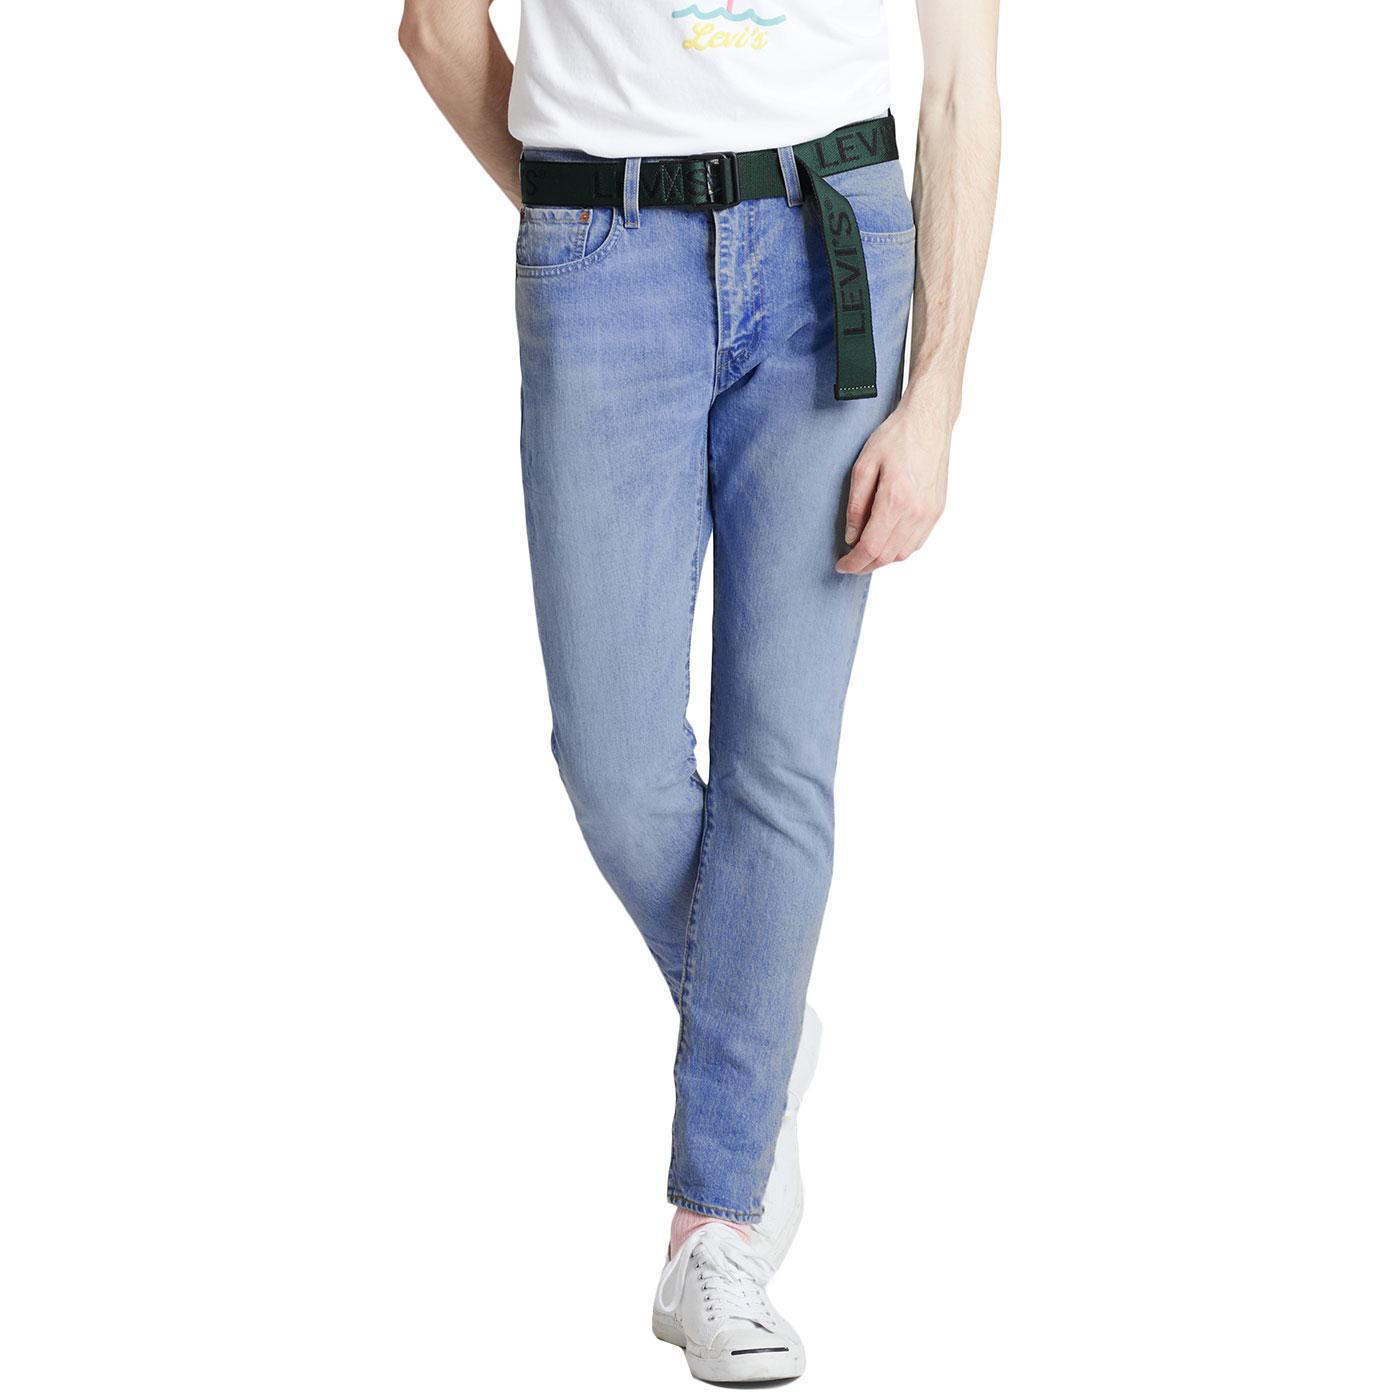 LEVI'S 512 Slim Taper Denim Jeans (Cedar Light)